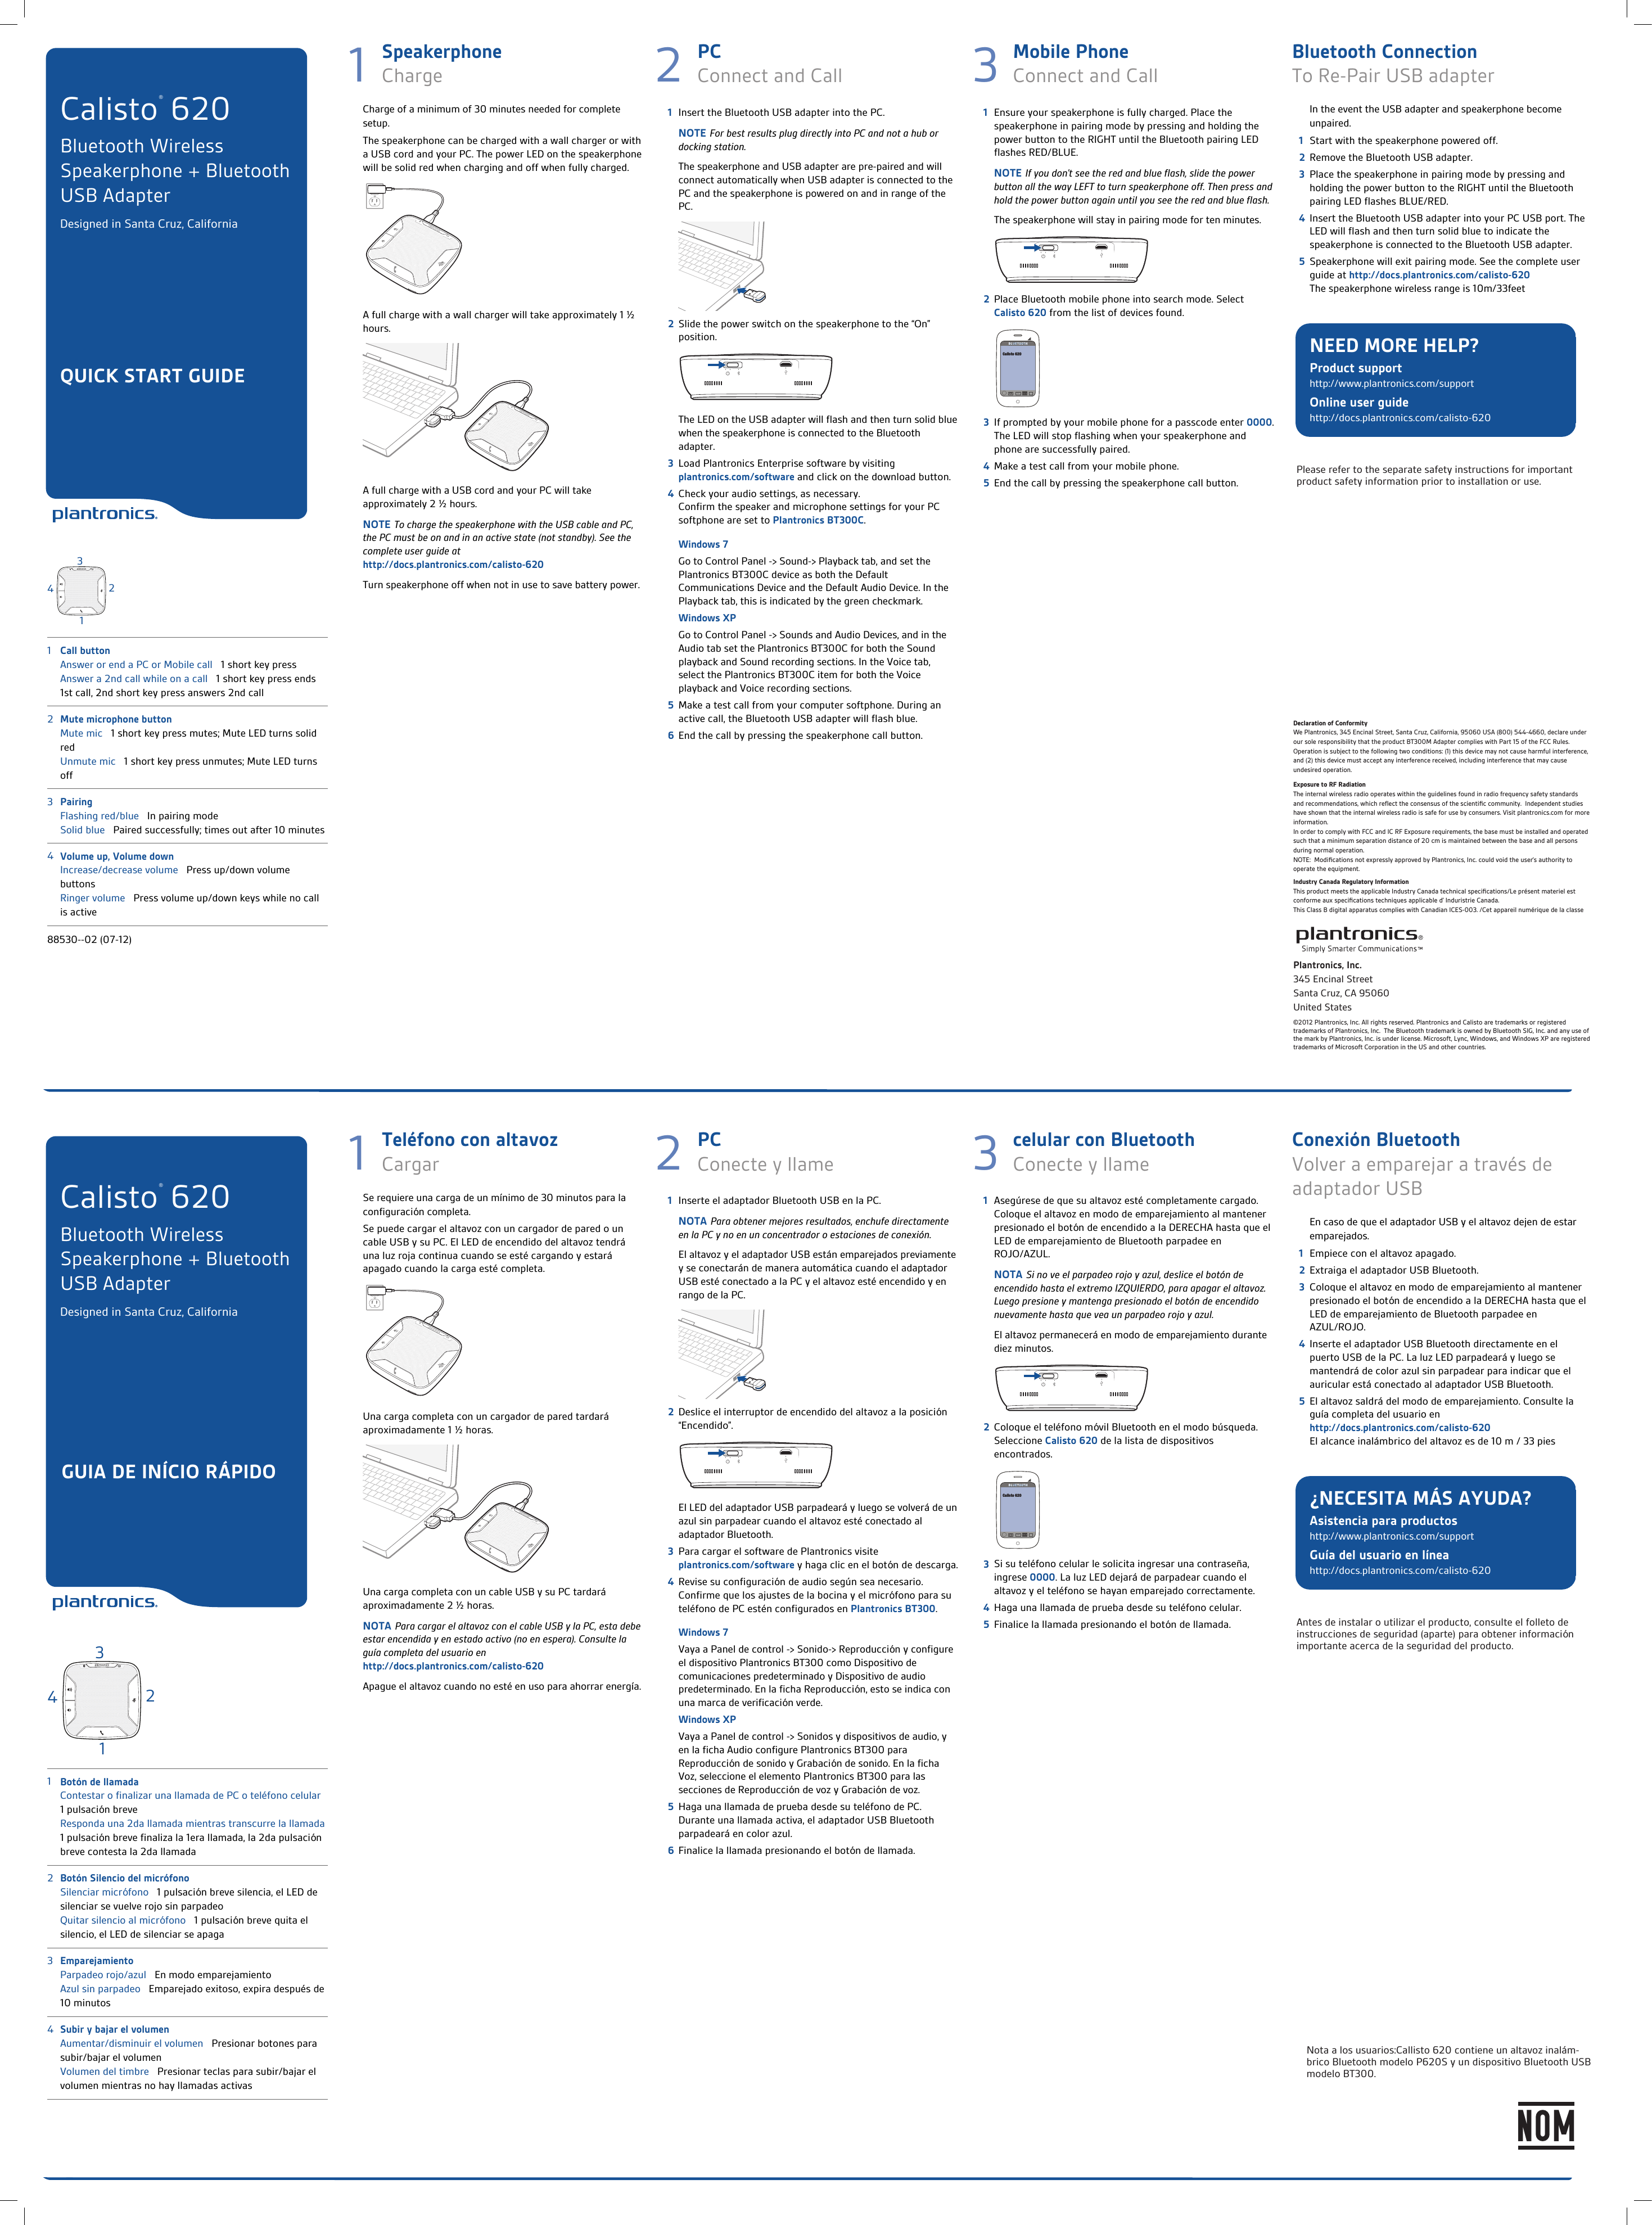 Plantronics P620s Bluetooth Speakerphone User Manual